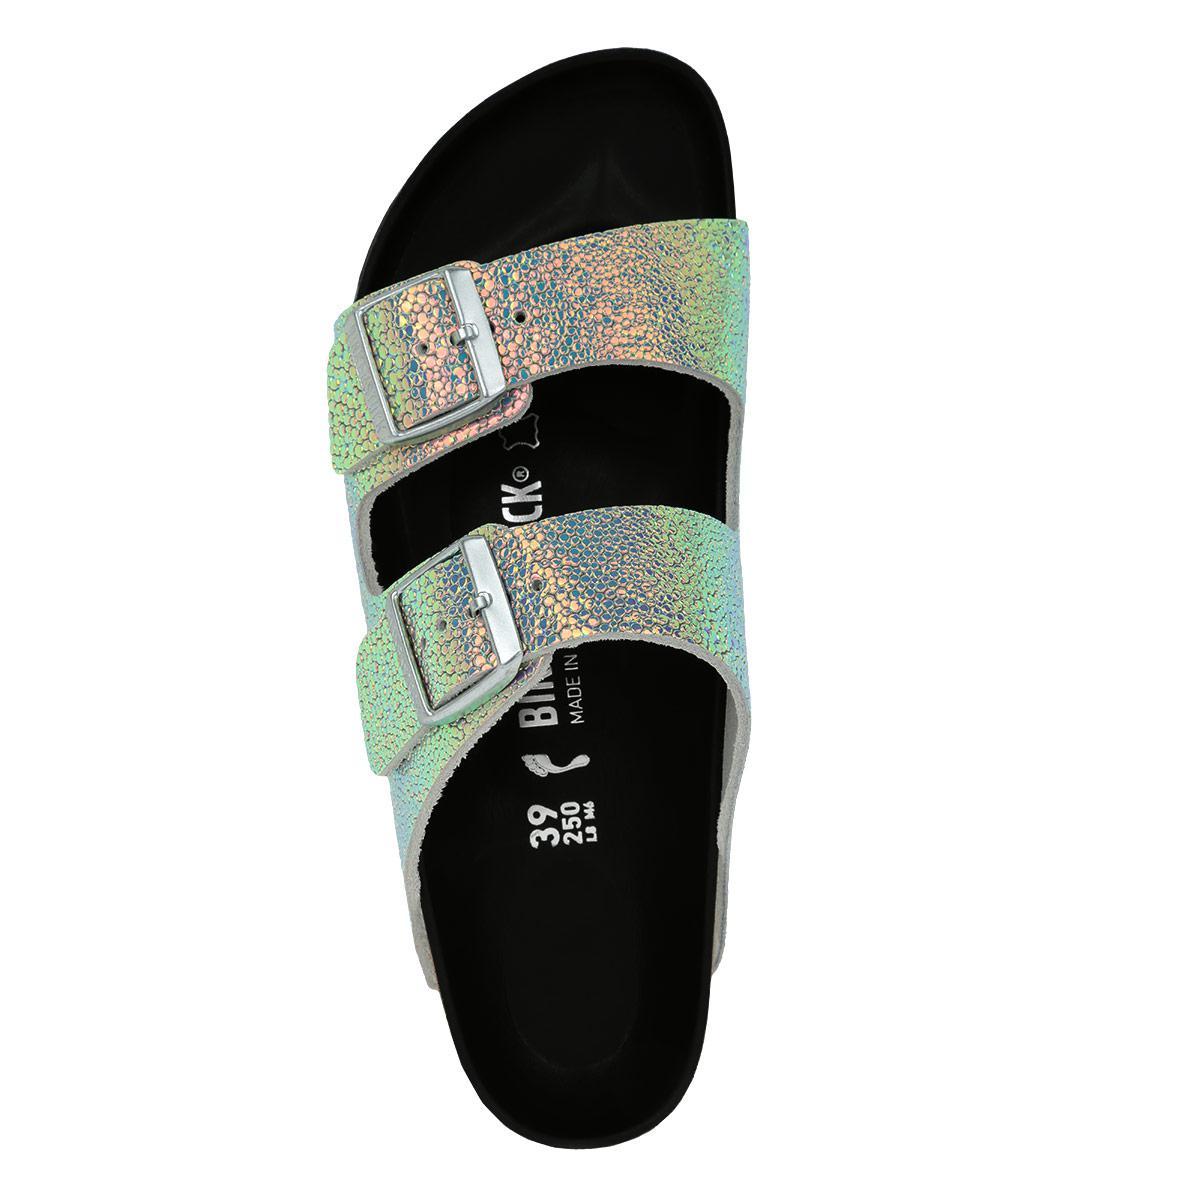 41003b46a19 Birkenstock Arizona Bs Narrow Fit Sandal Ombre Pearls Silver Black ...